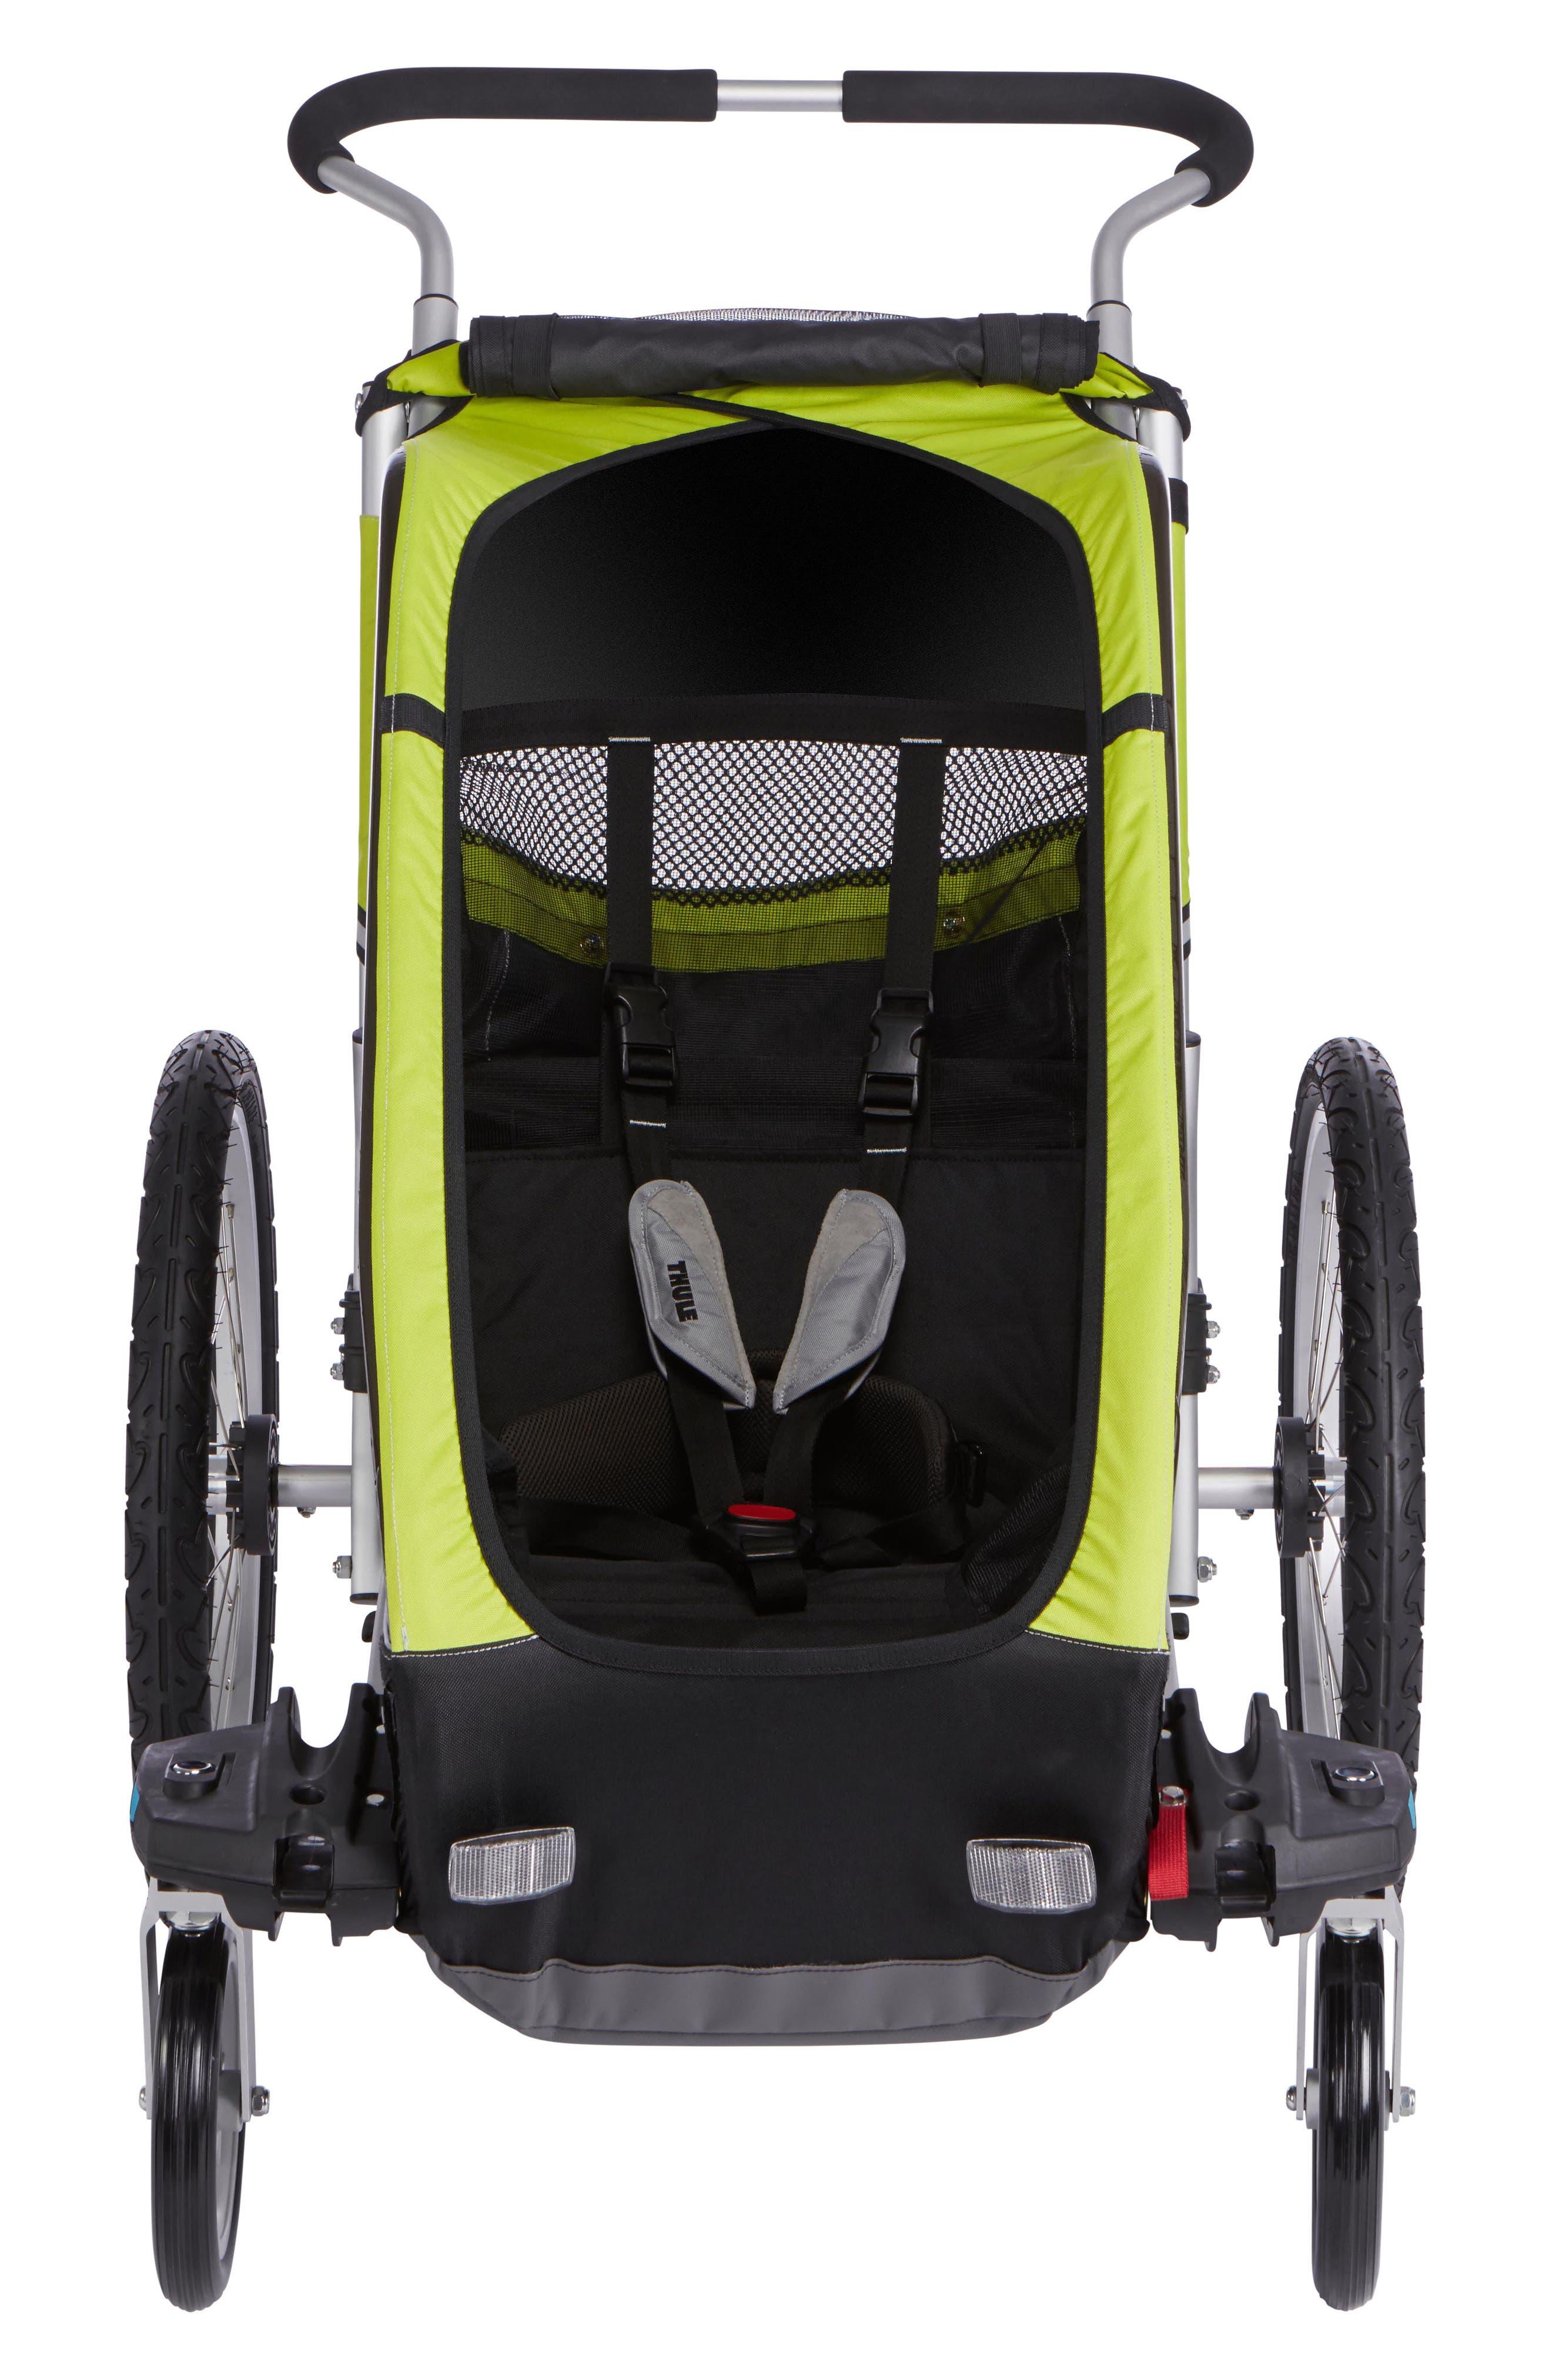 Chariot Cheetah XT 2 Multisport Cycle Trailer/Stroller,                             Main thumbnail 1, color,                             CHARTREUSE